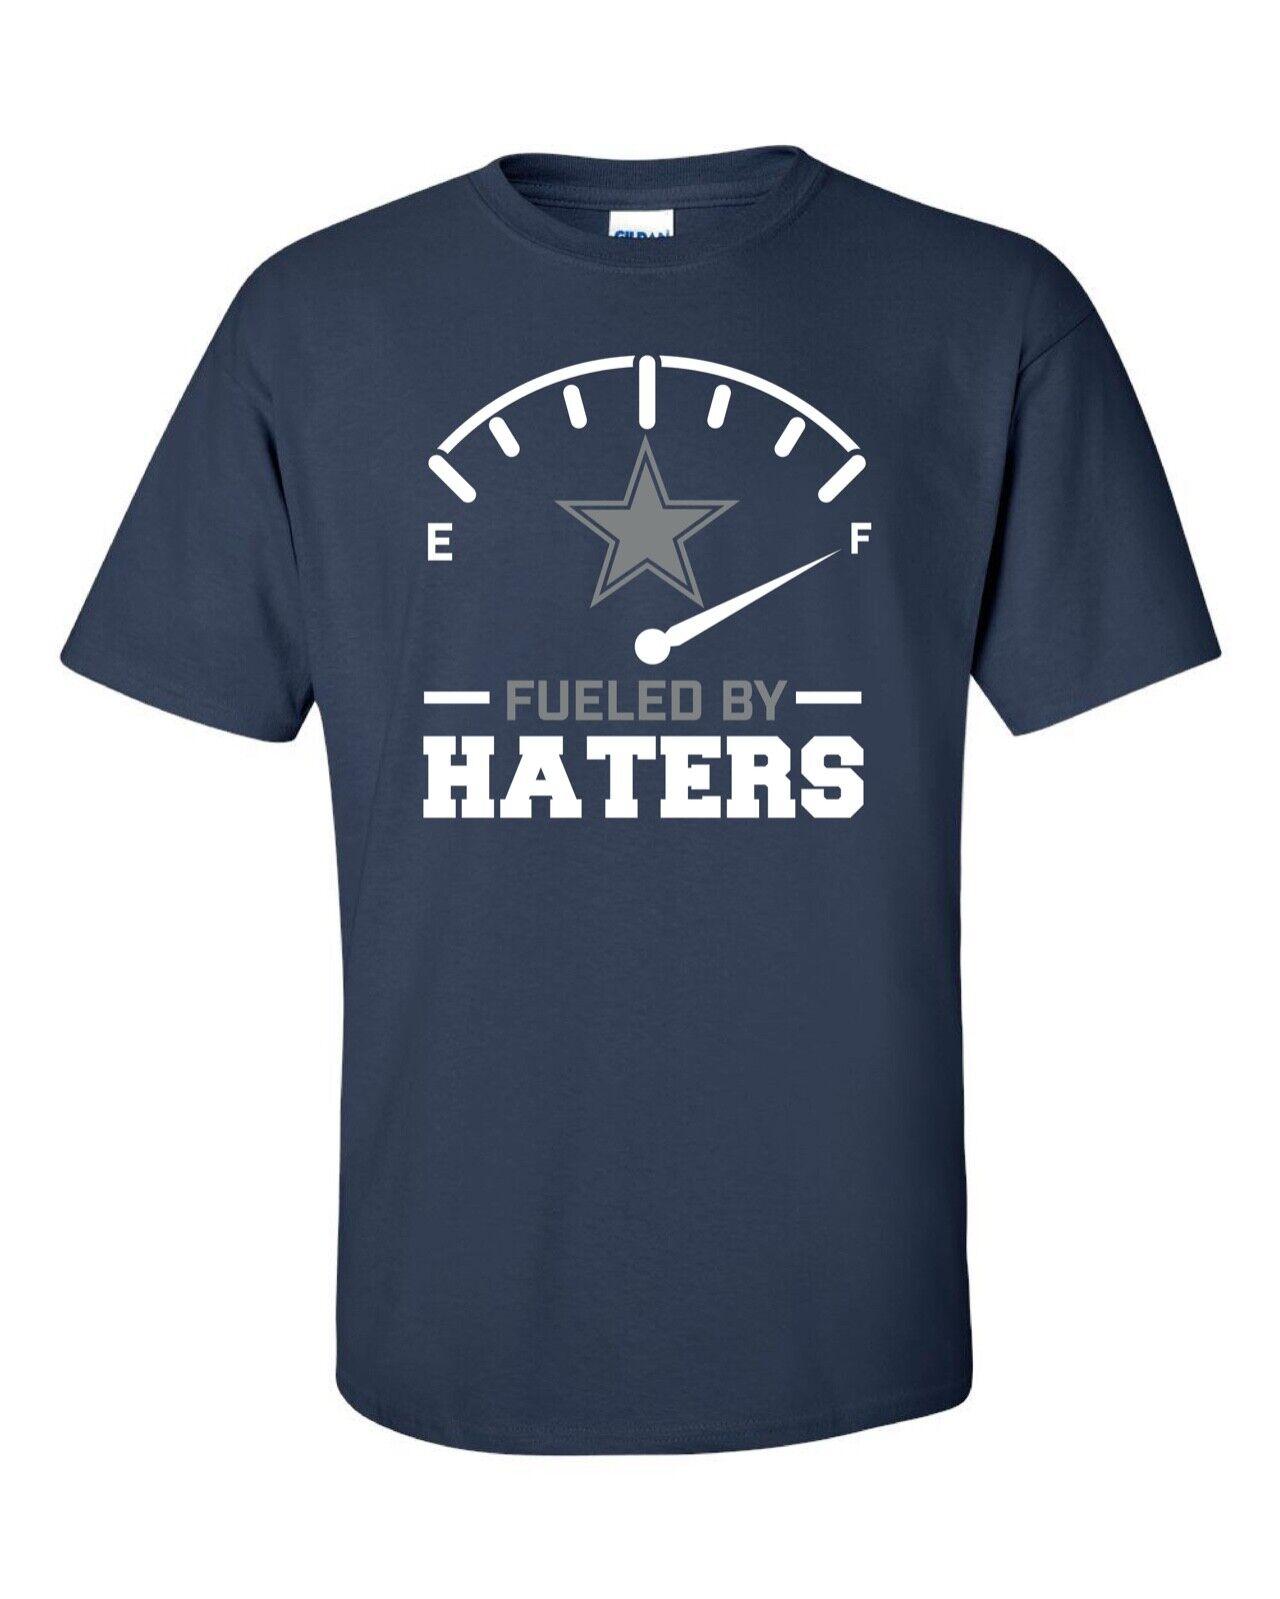 Dallas Cowboys Fueled By Haters S-5X t-shirt Dak Zeke Amari Cooper FREE SHIPPING